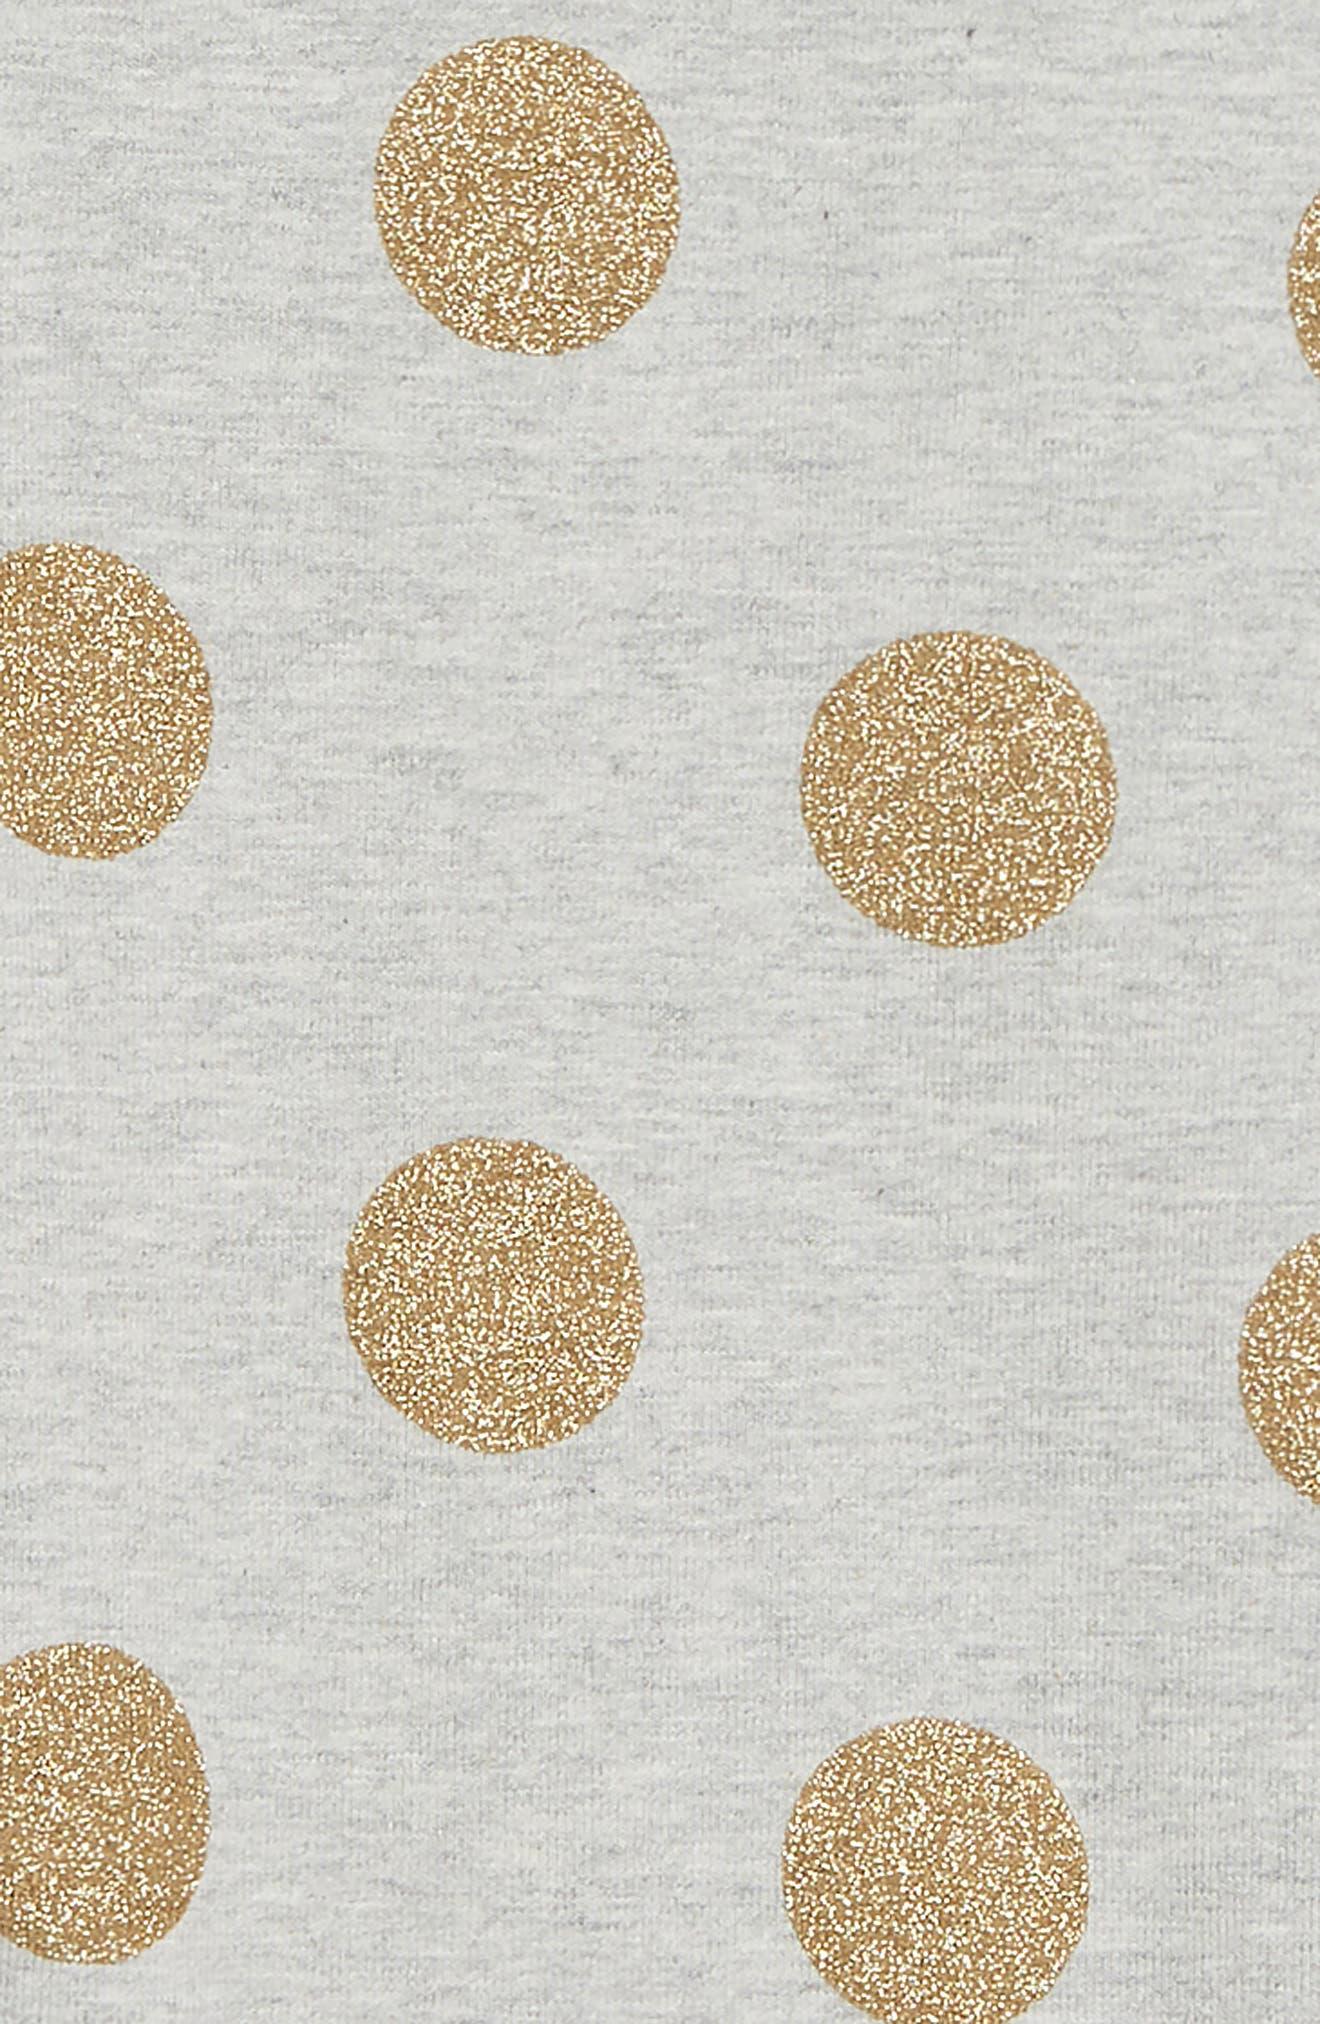 Detail Leggings,                             Alternate thumbnail 2, color,                             GREY MARLE/ GOLD FOIL SPOT